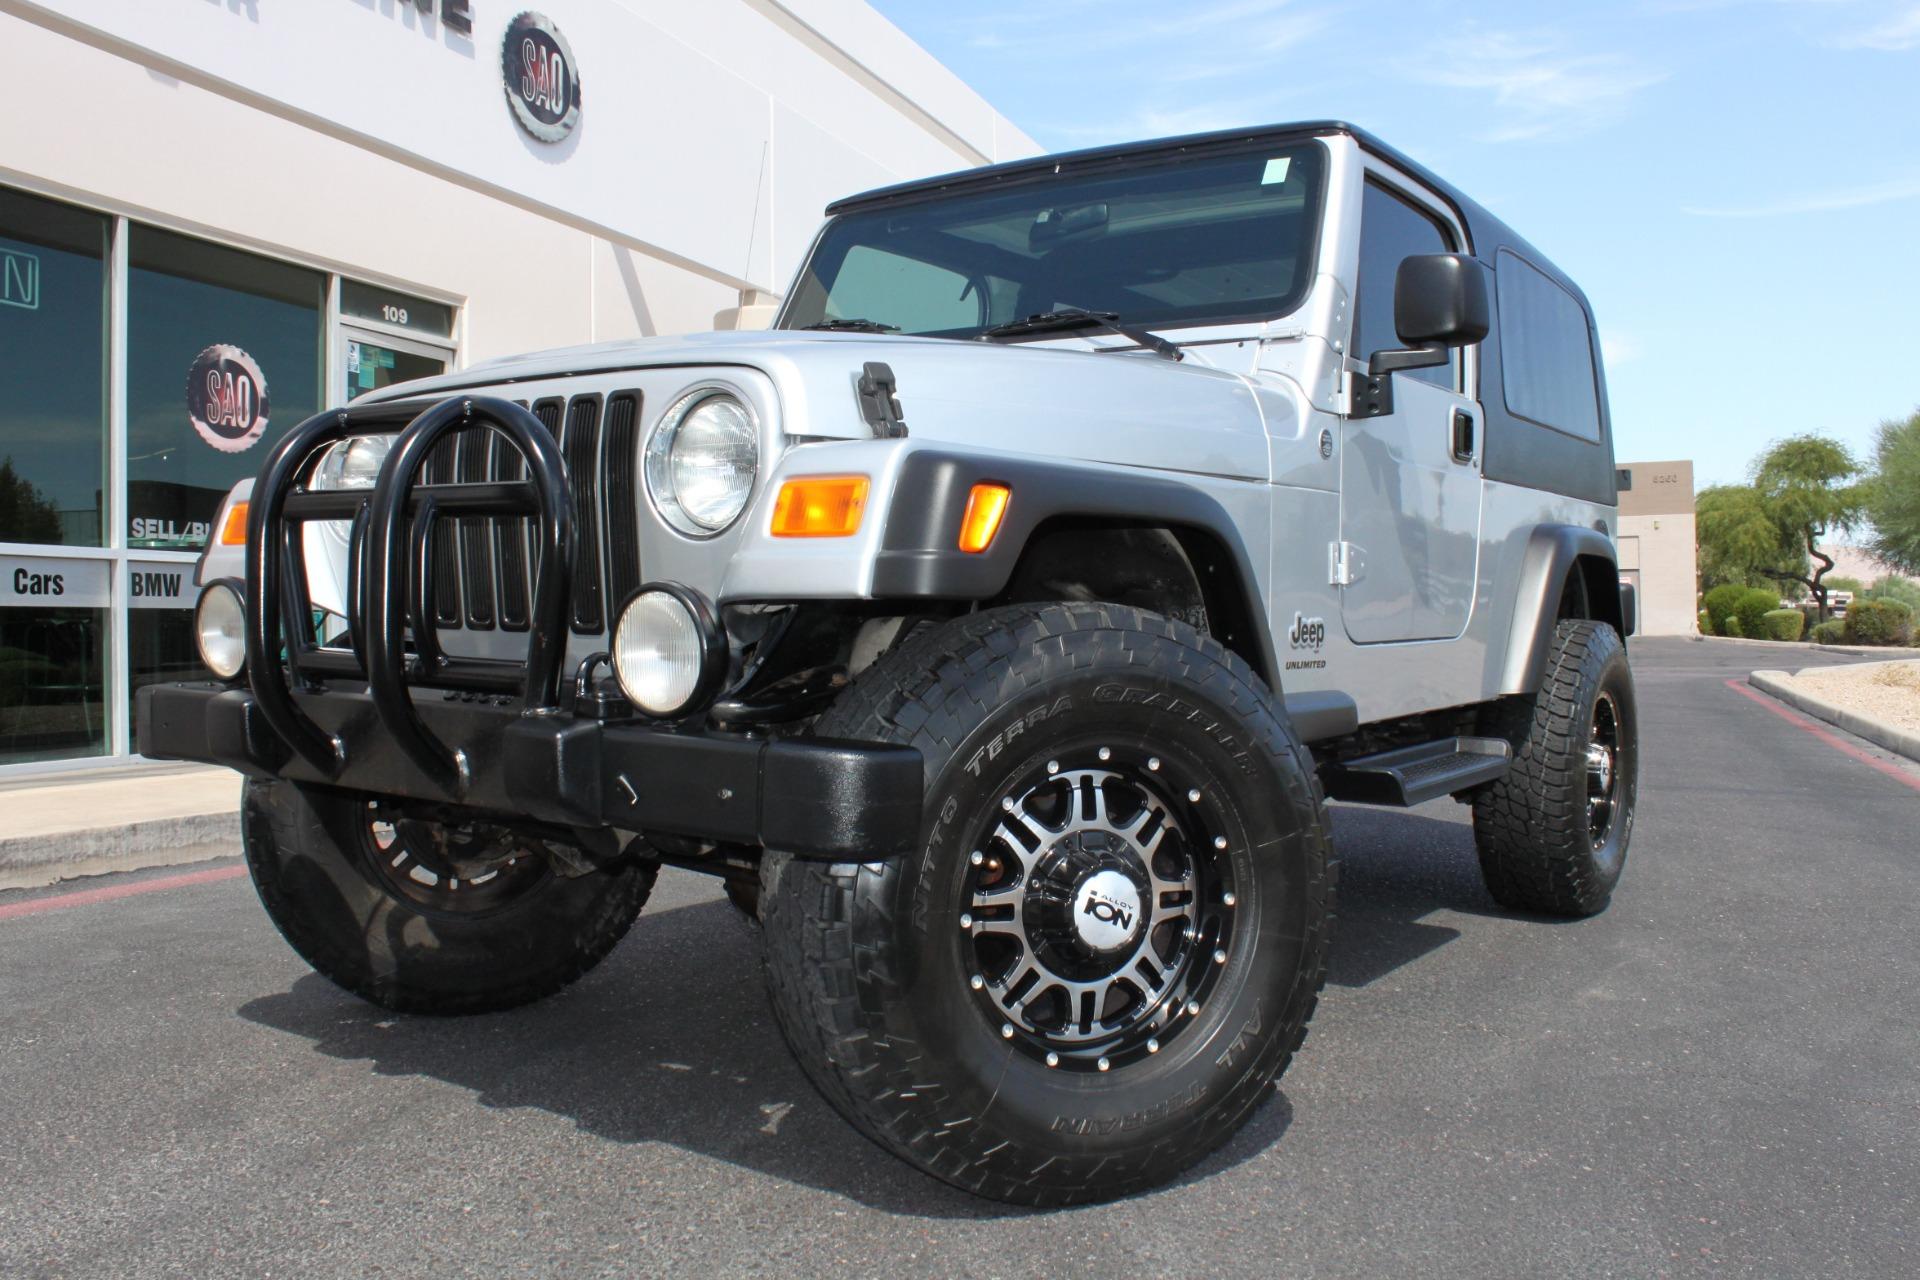 Used 2006 Jeep Wrangler <span>Unlimited LWB</span> | Scottsdale, AZ